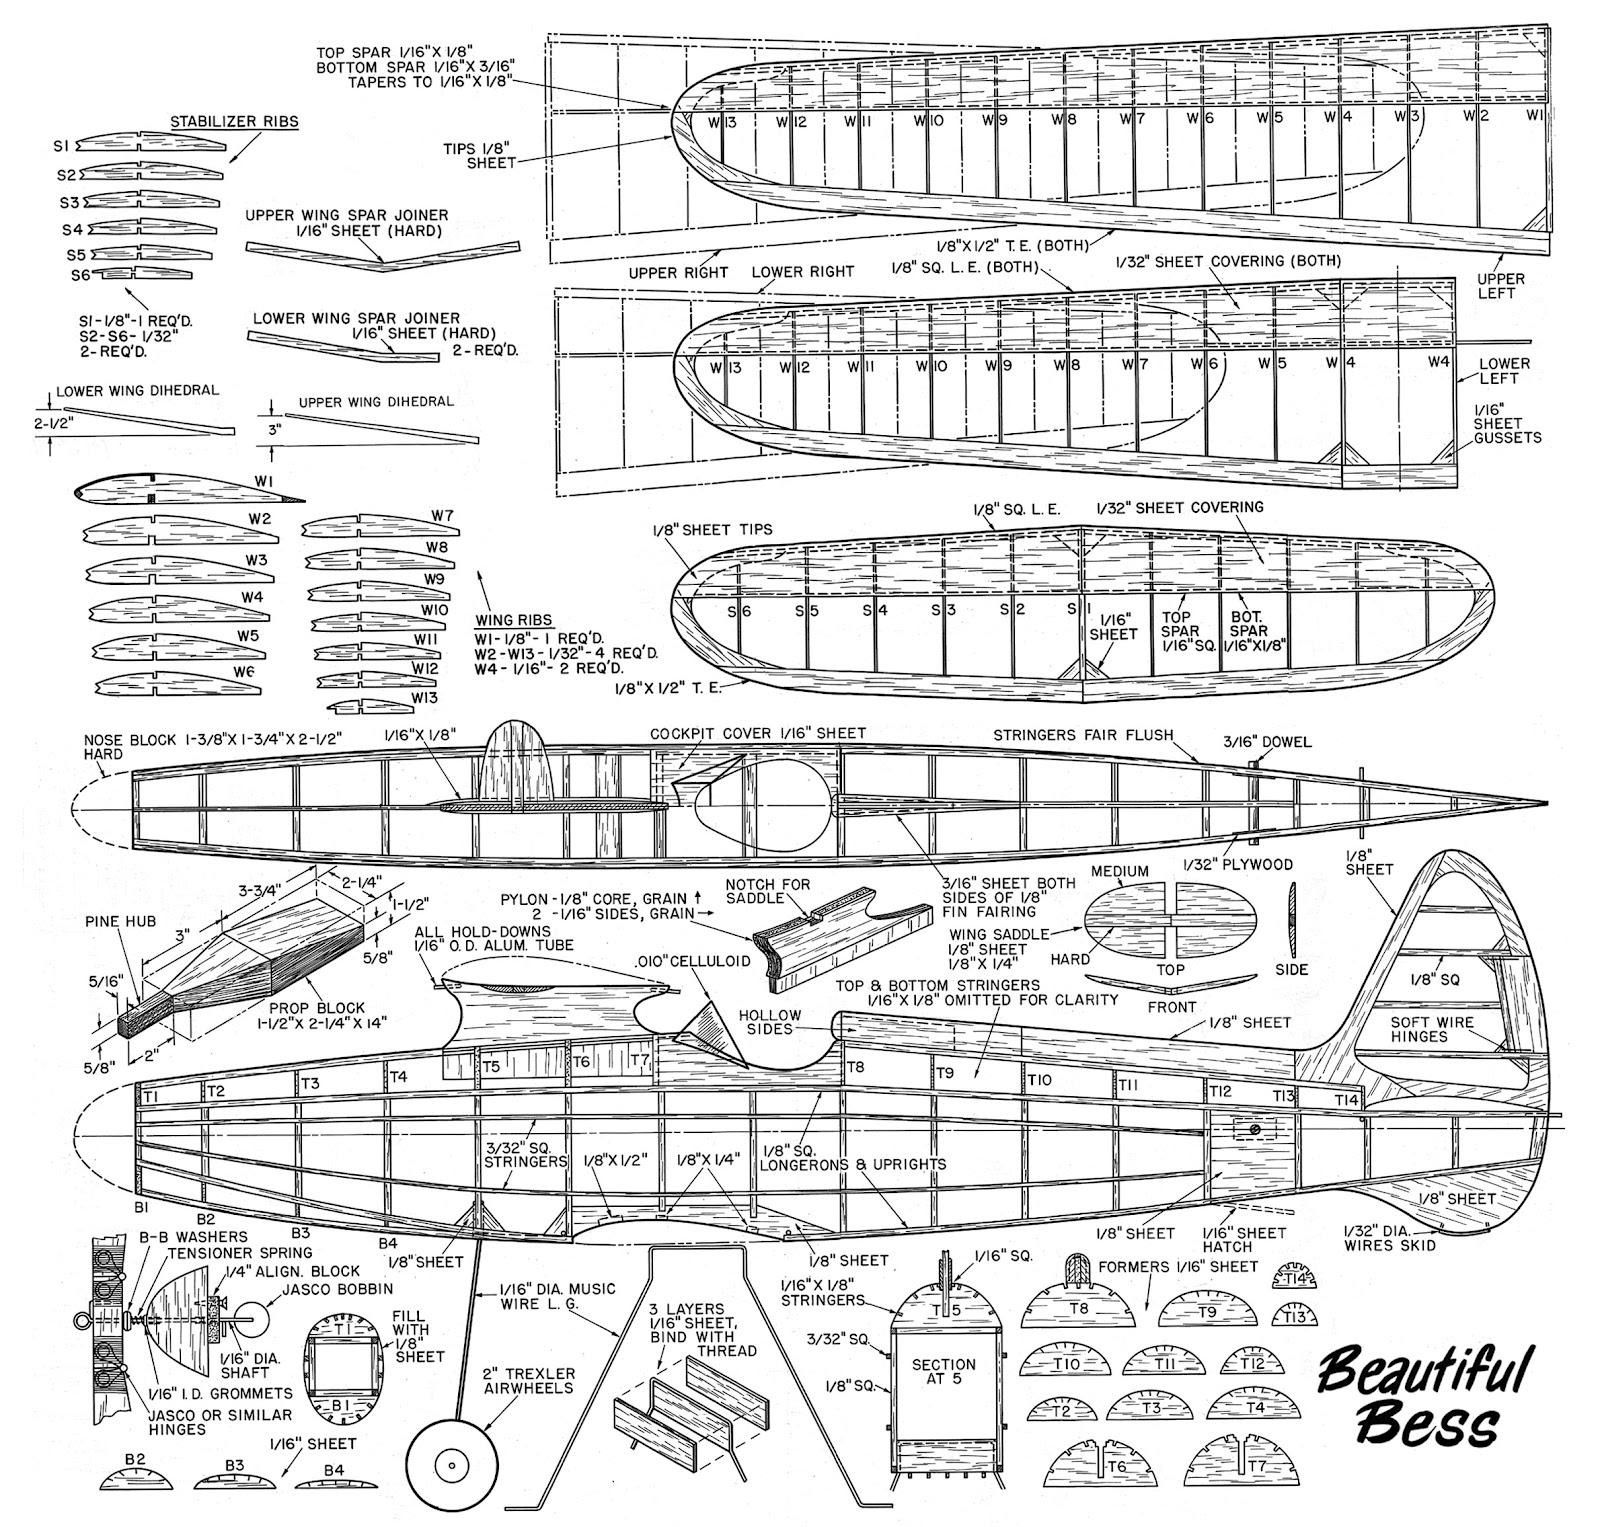 Beautiful Bess Jpg 1600 1527 Model Airplanes Rc Plane Plans